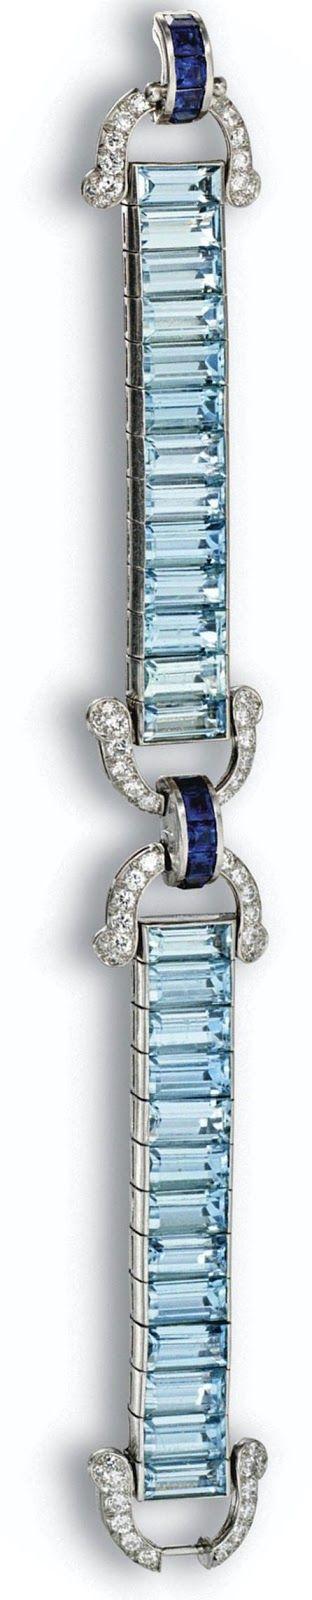 Alternate view: Art Deco aquamarine, sapphire, and diamond bracelet by Cartier, circa 1935. Via Diamonds in the Library.